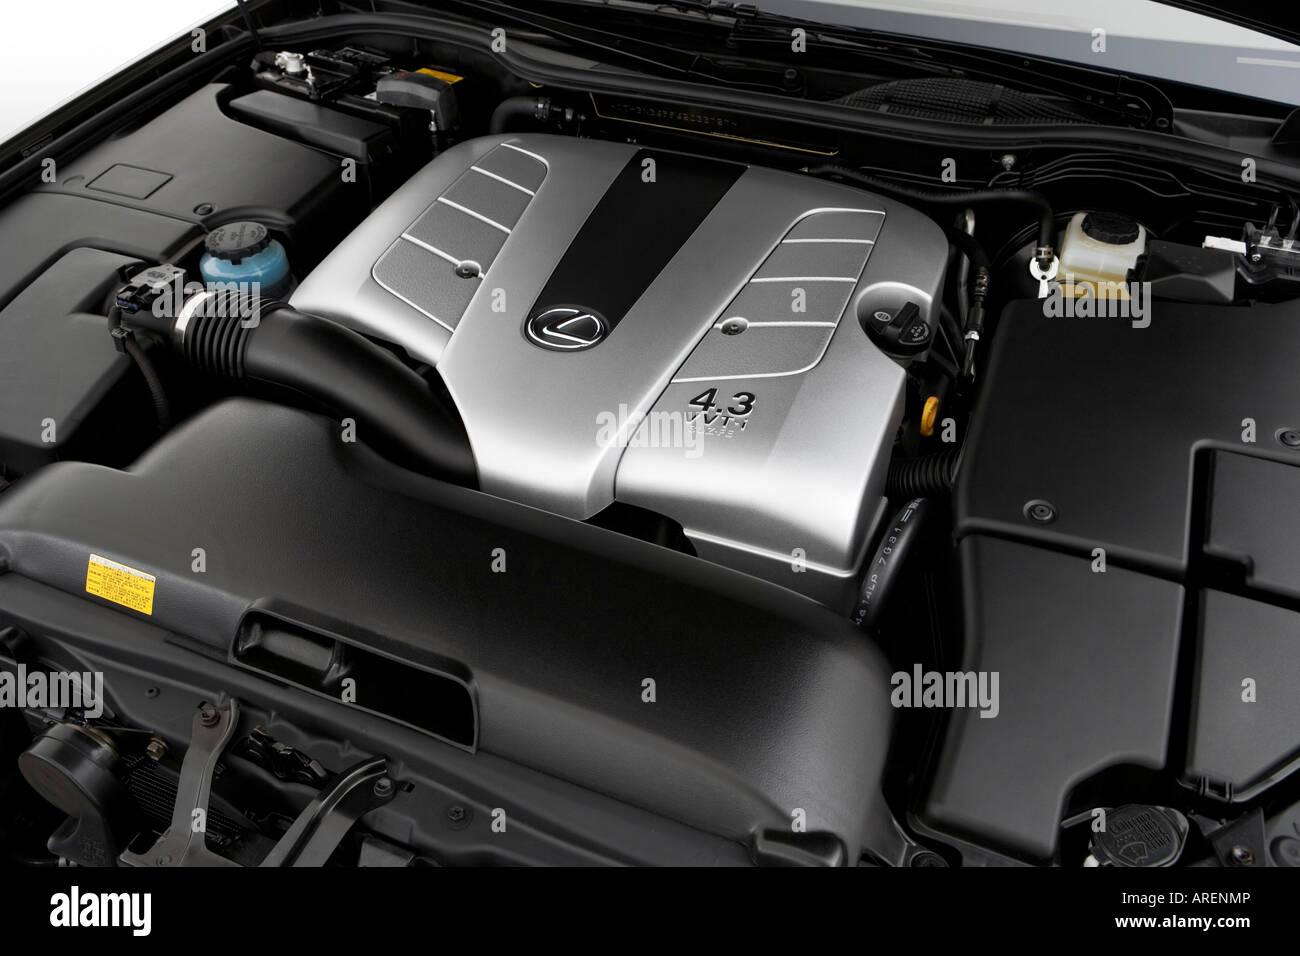 Lexus Ls 430 Stock Photos  U0026 Lexus Ls 430 Stock Images